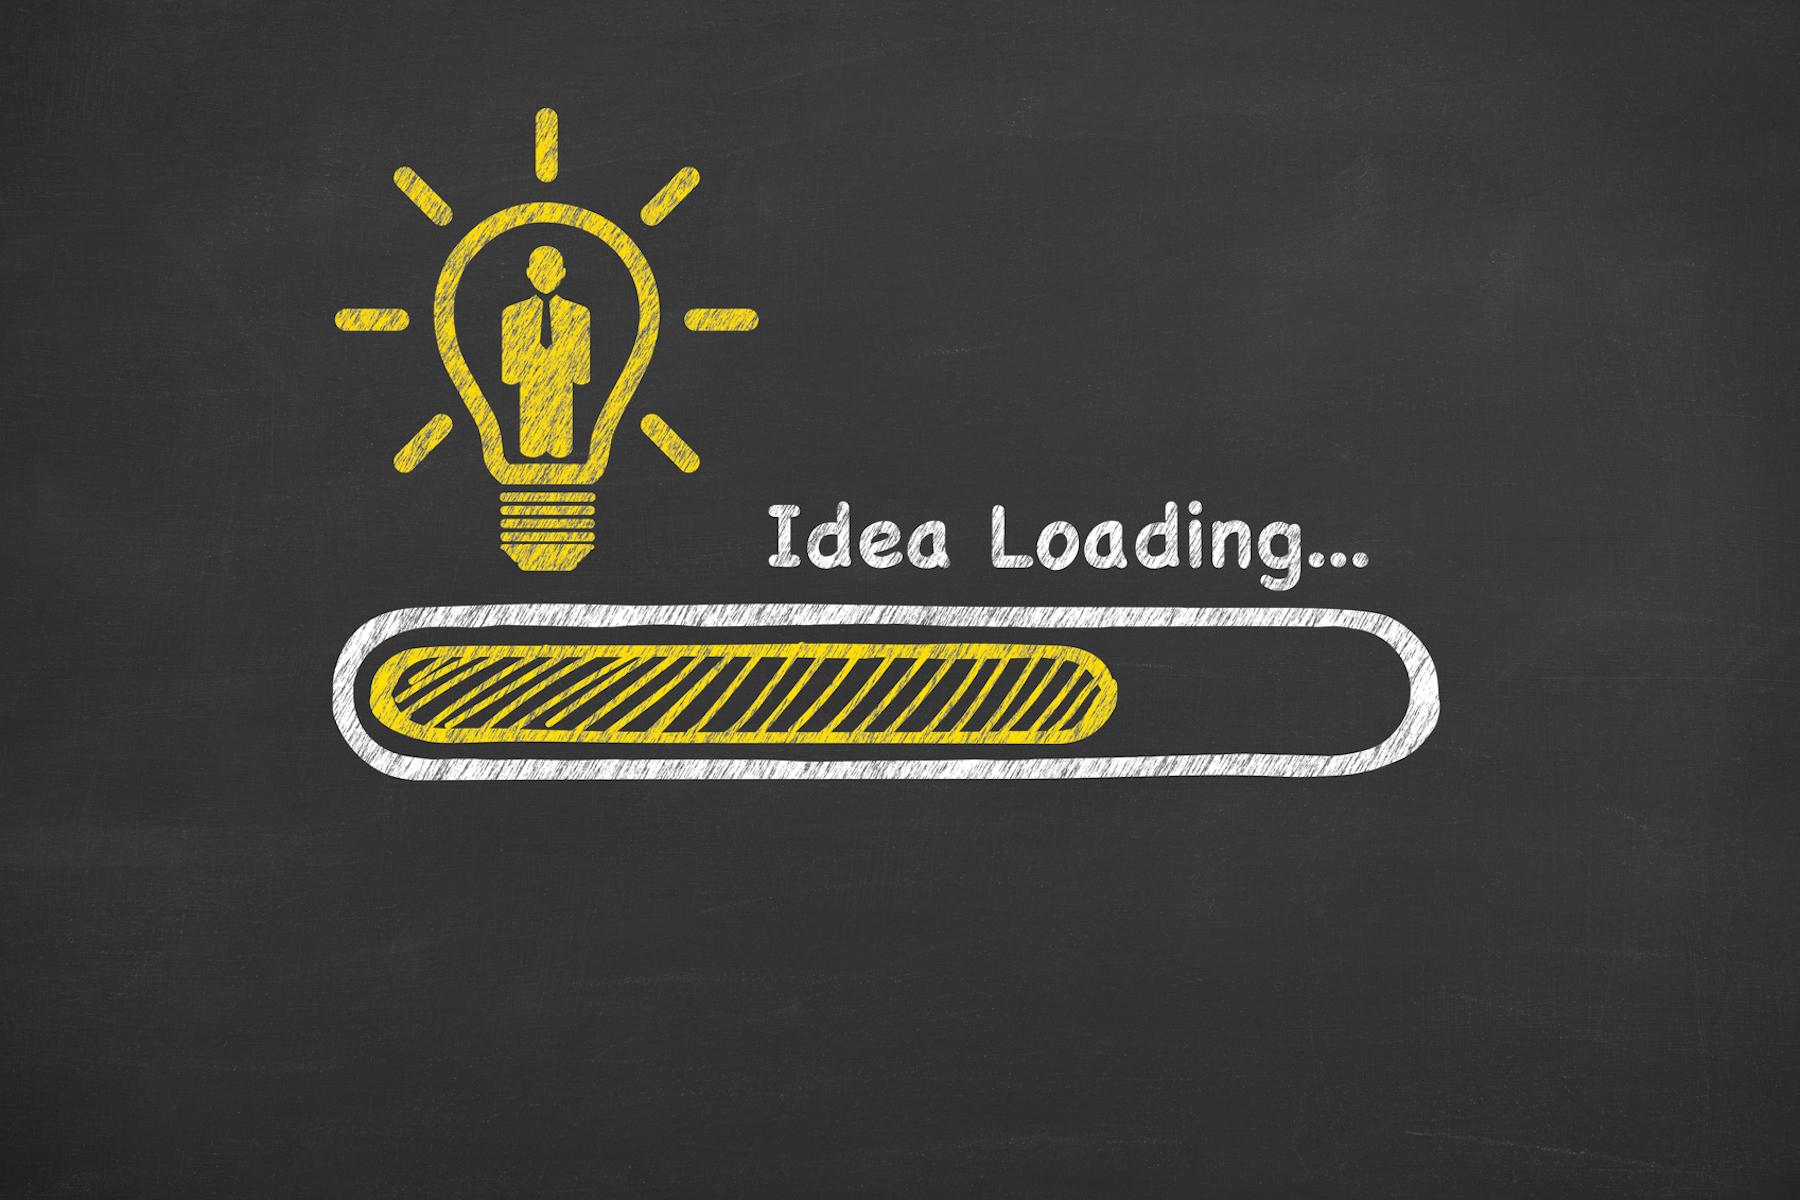 Human Resource Idea Loading on Blackboard